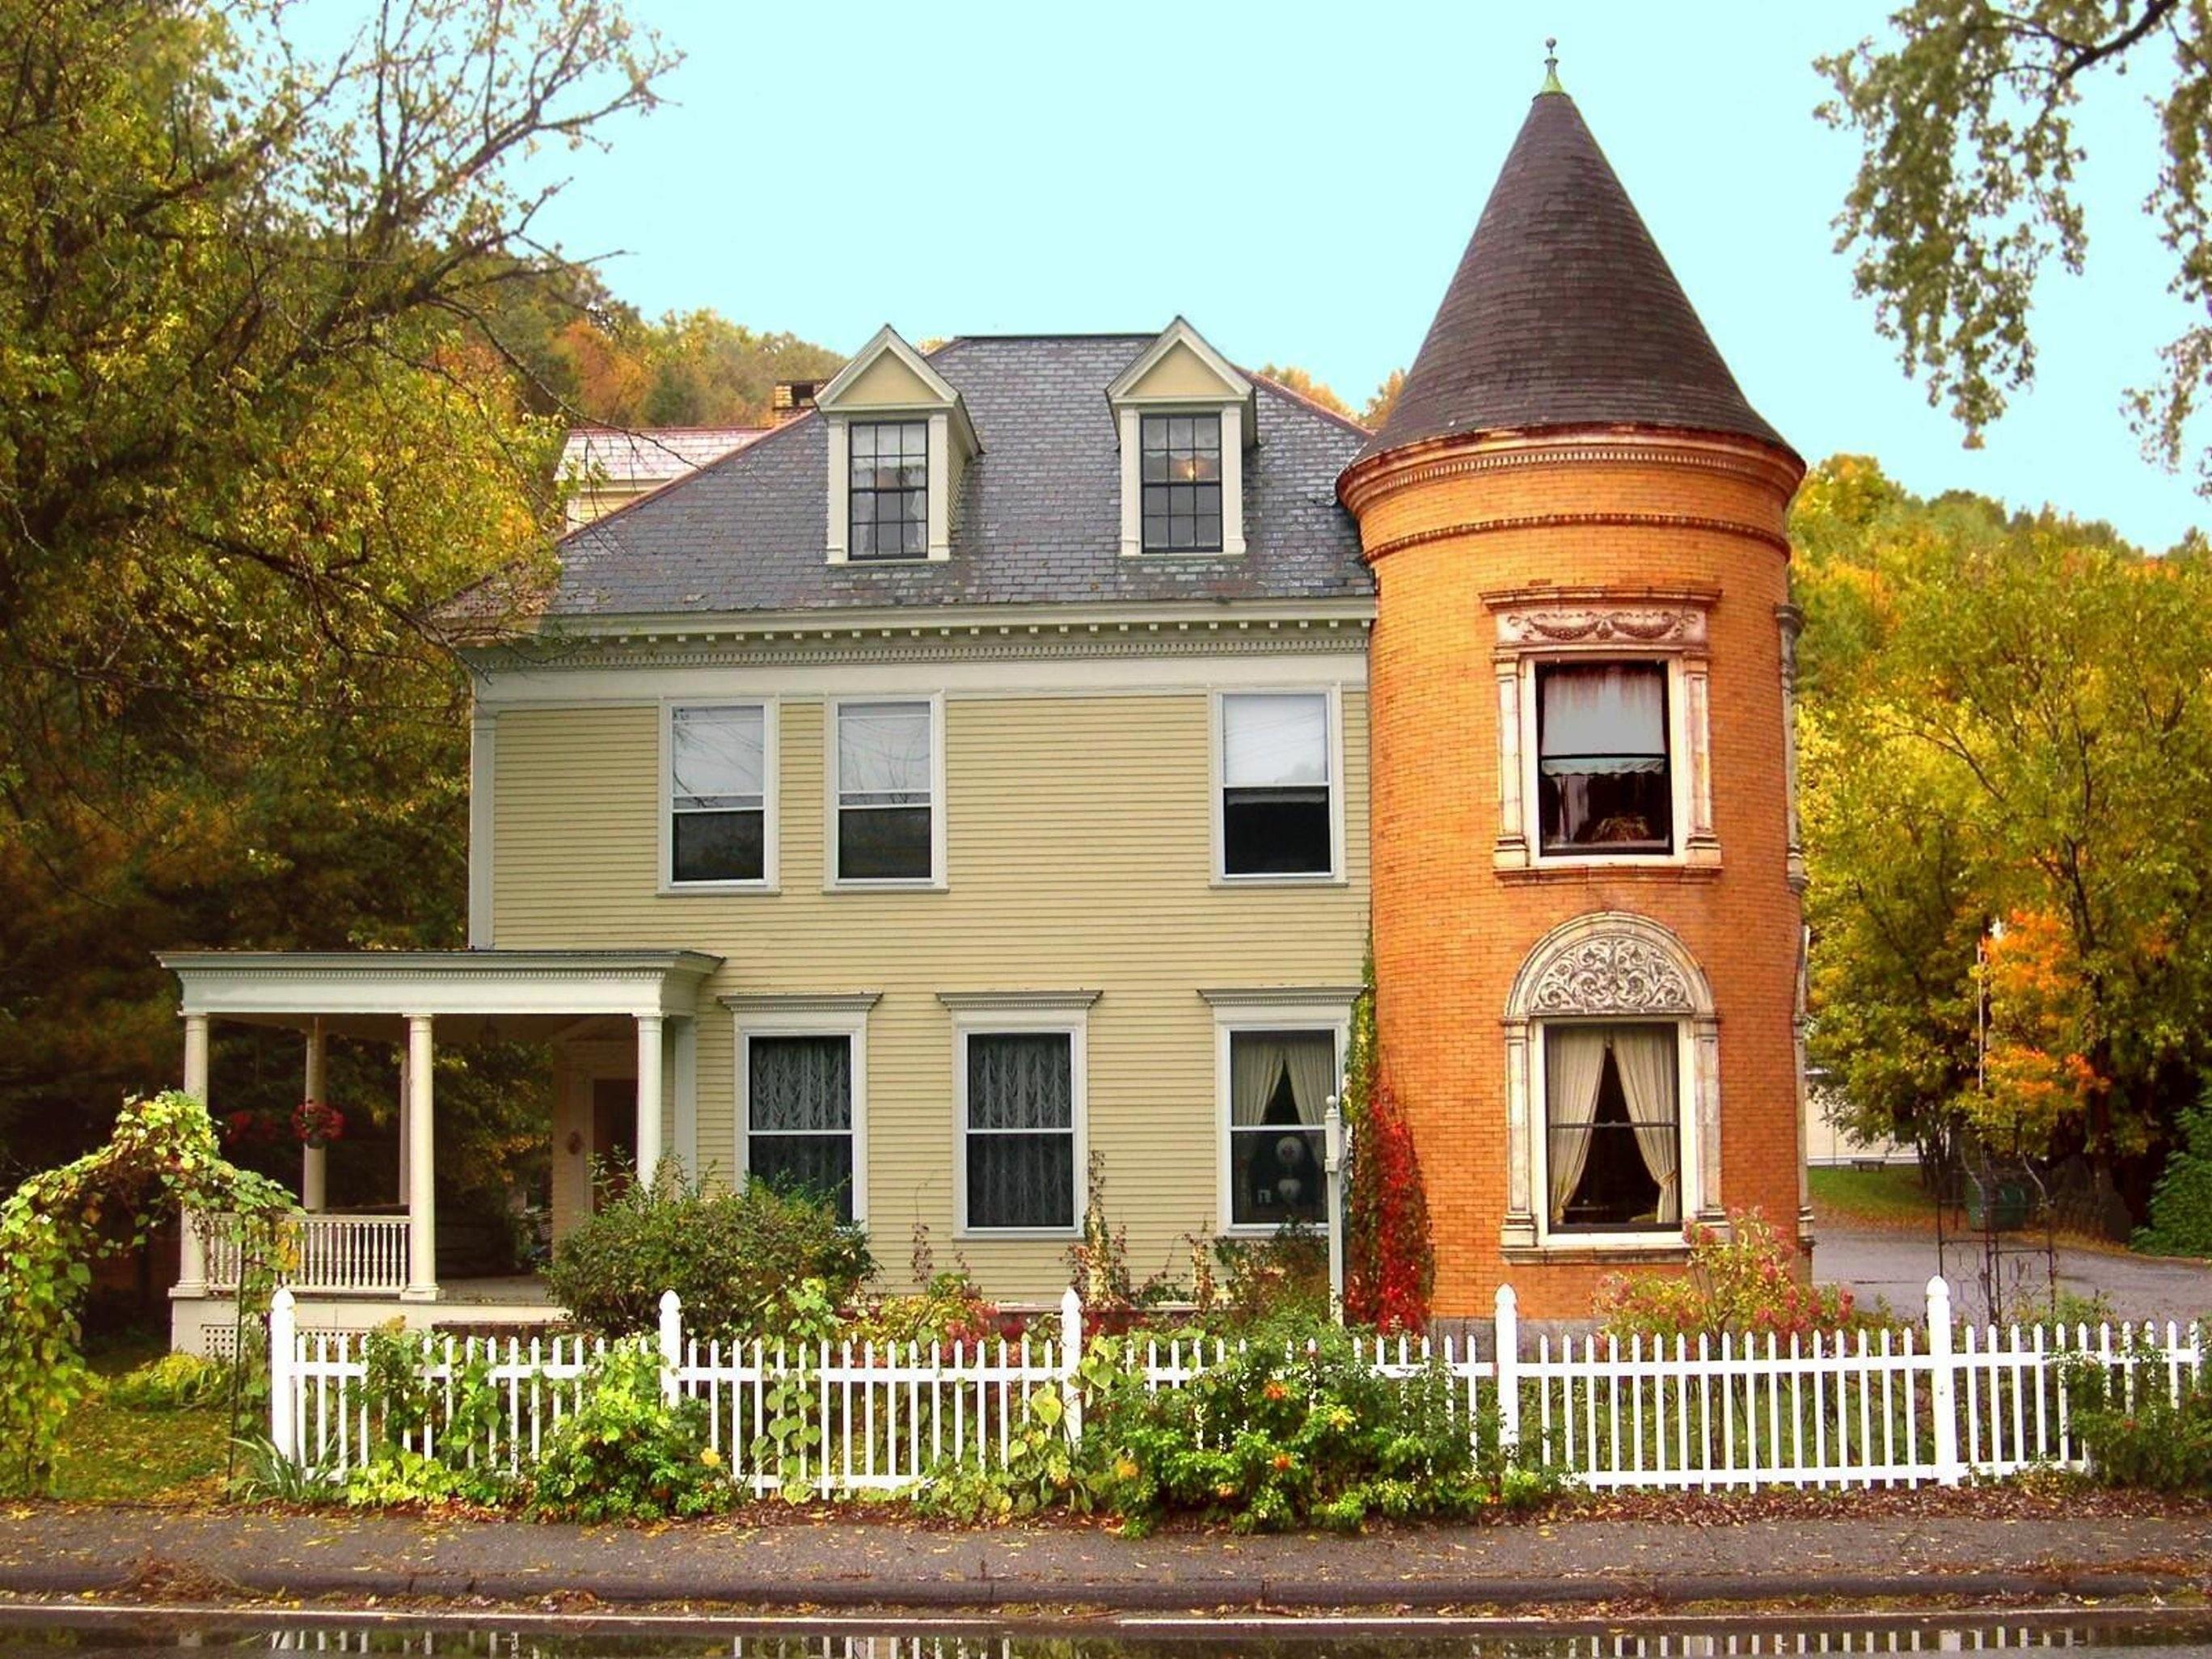 vt bed house inn jackson vermont breakfast and businesses woodstock exterior